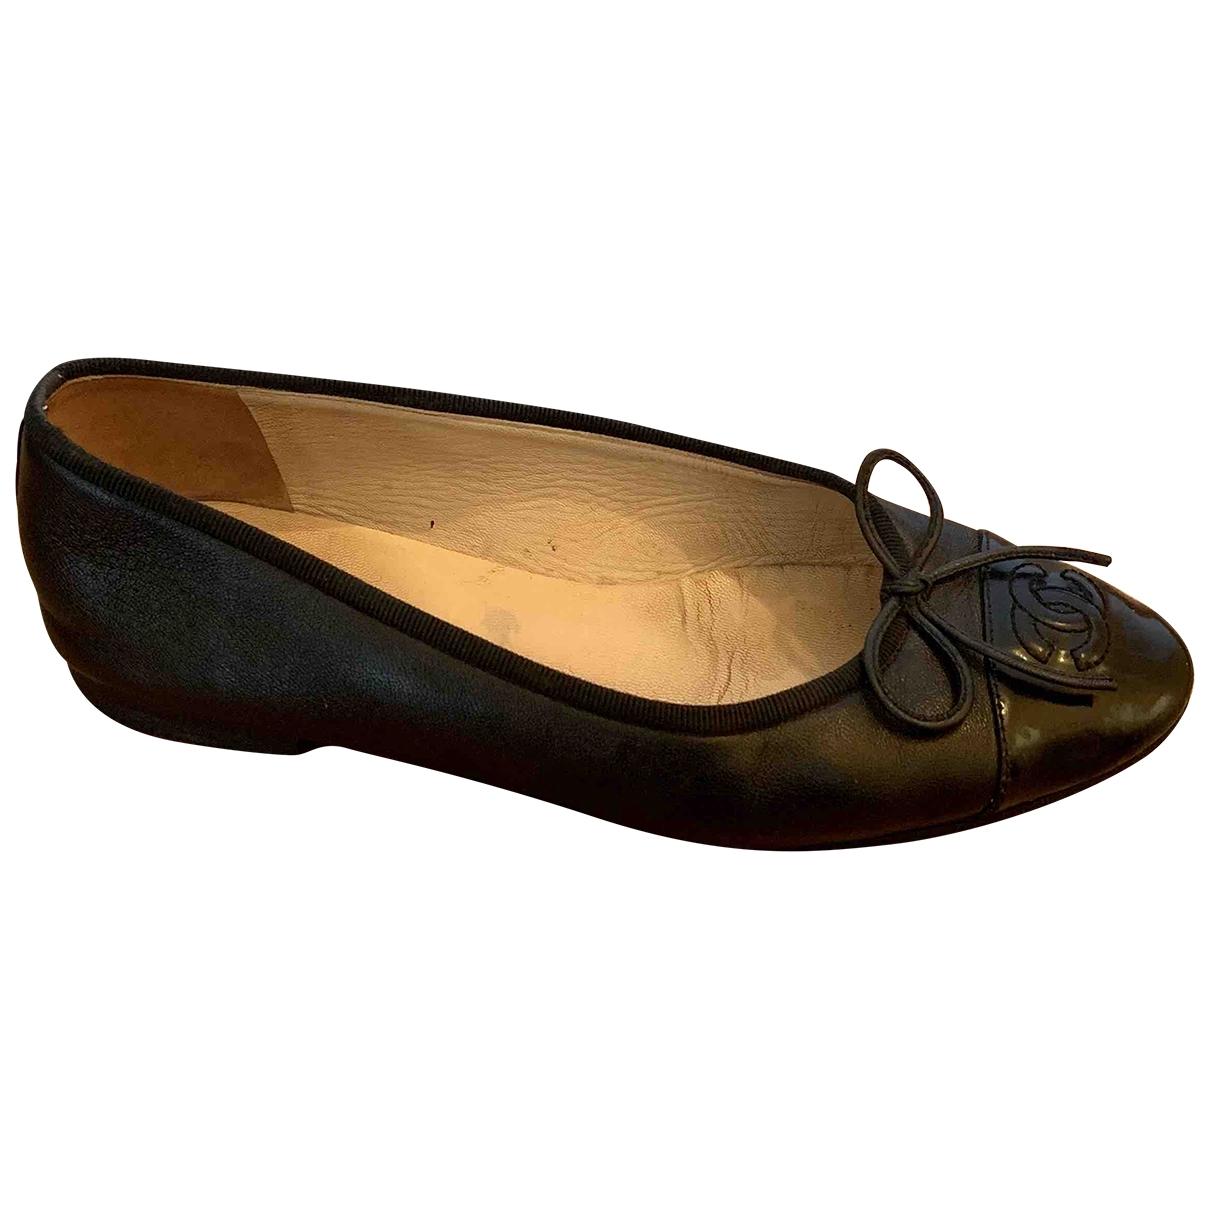 Chanel \N Black Leather Ballet flats for Women 36 IT